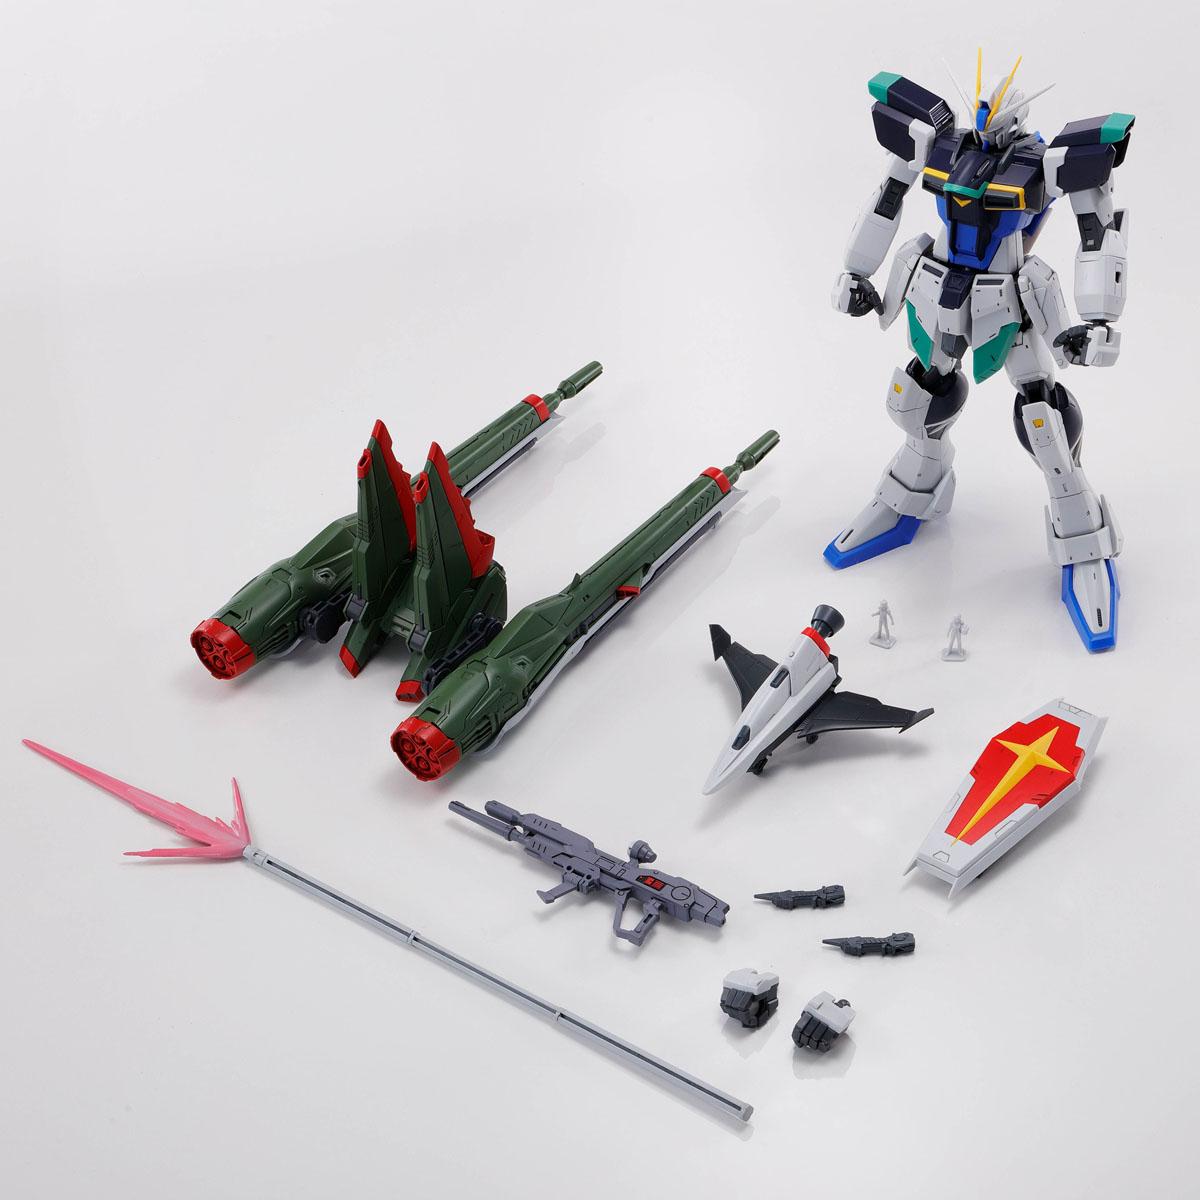 MG 1/100 BLAST IMPULSE GUNDAM [Mar 2020 Delivery]